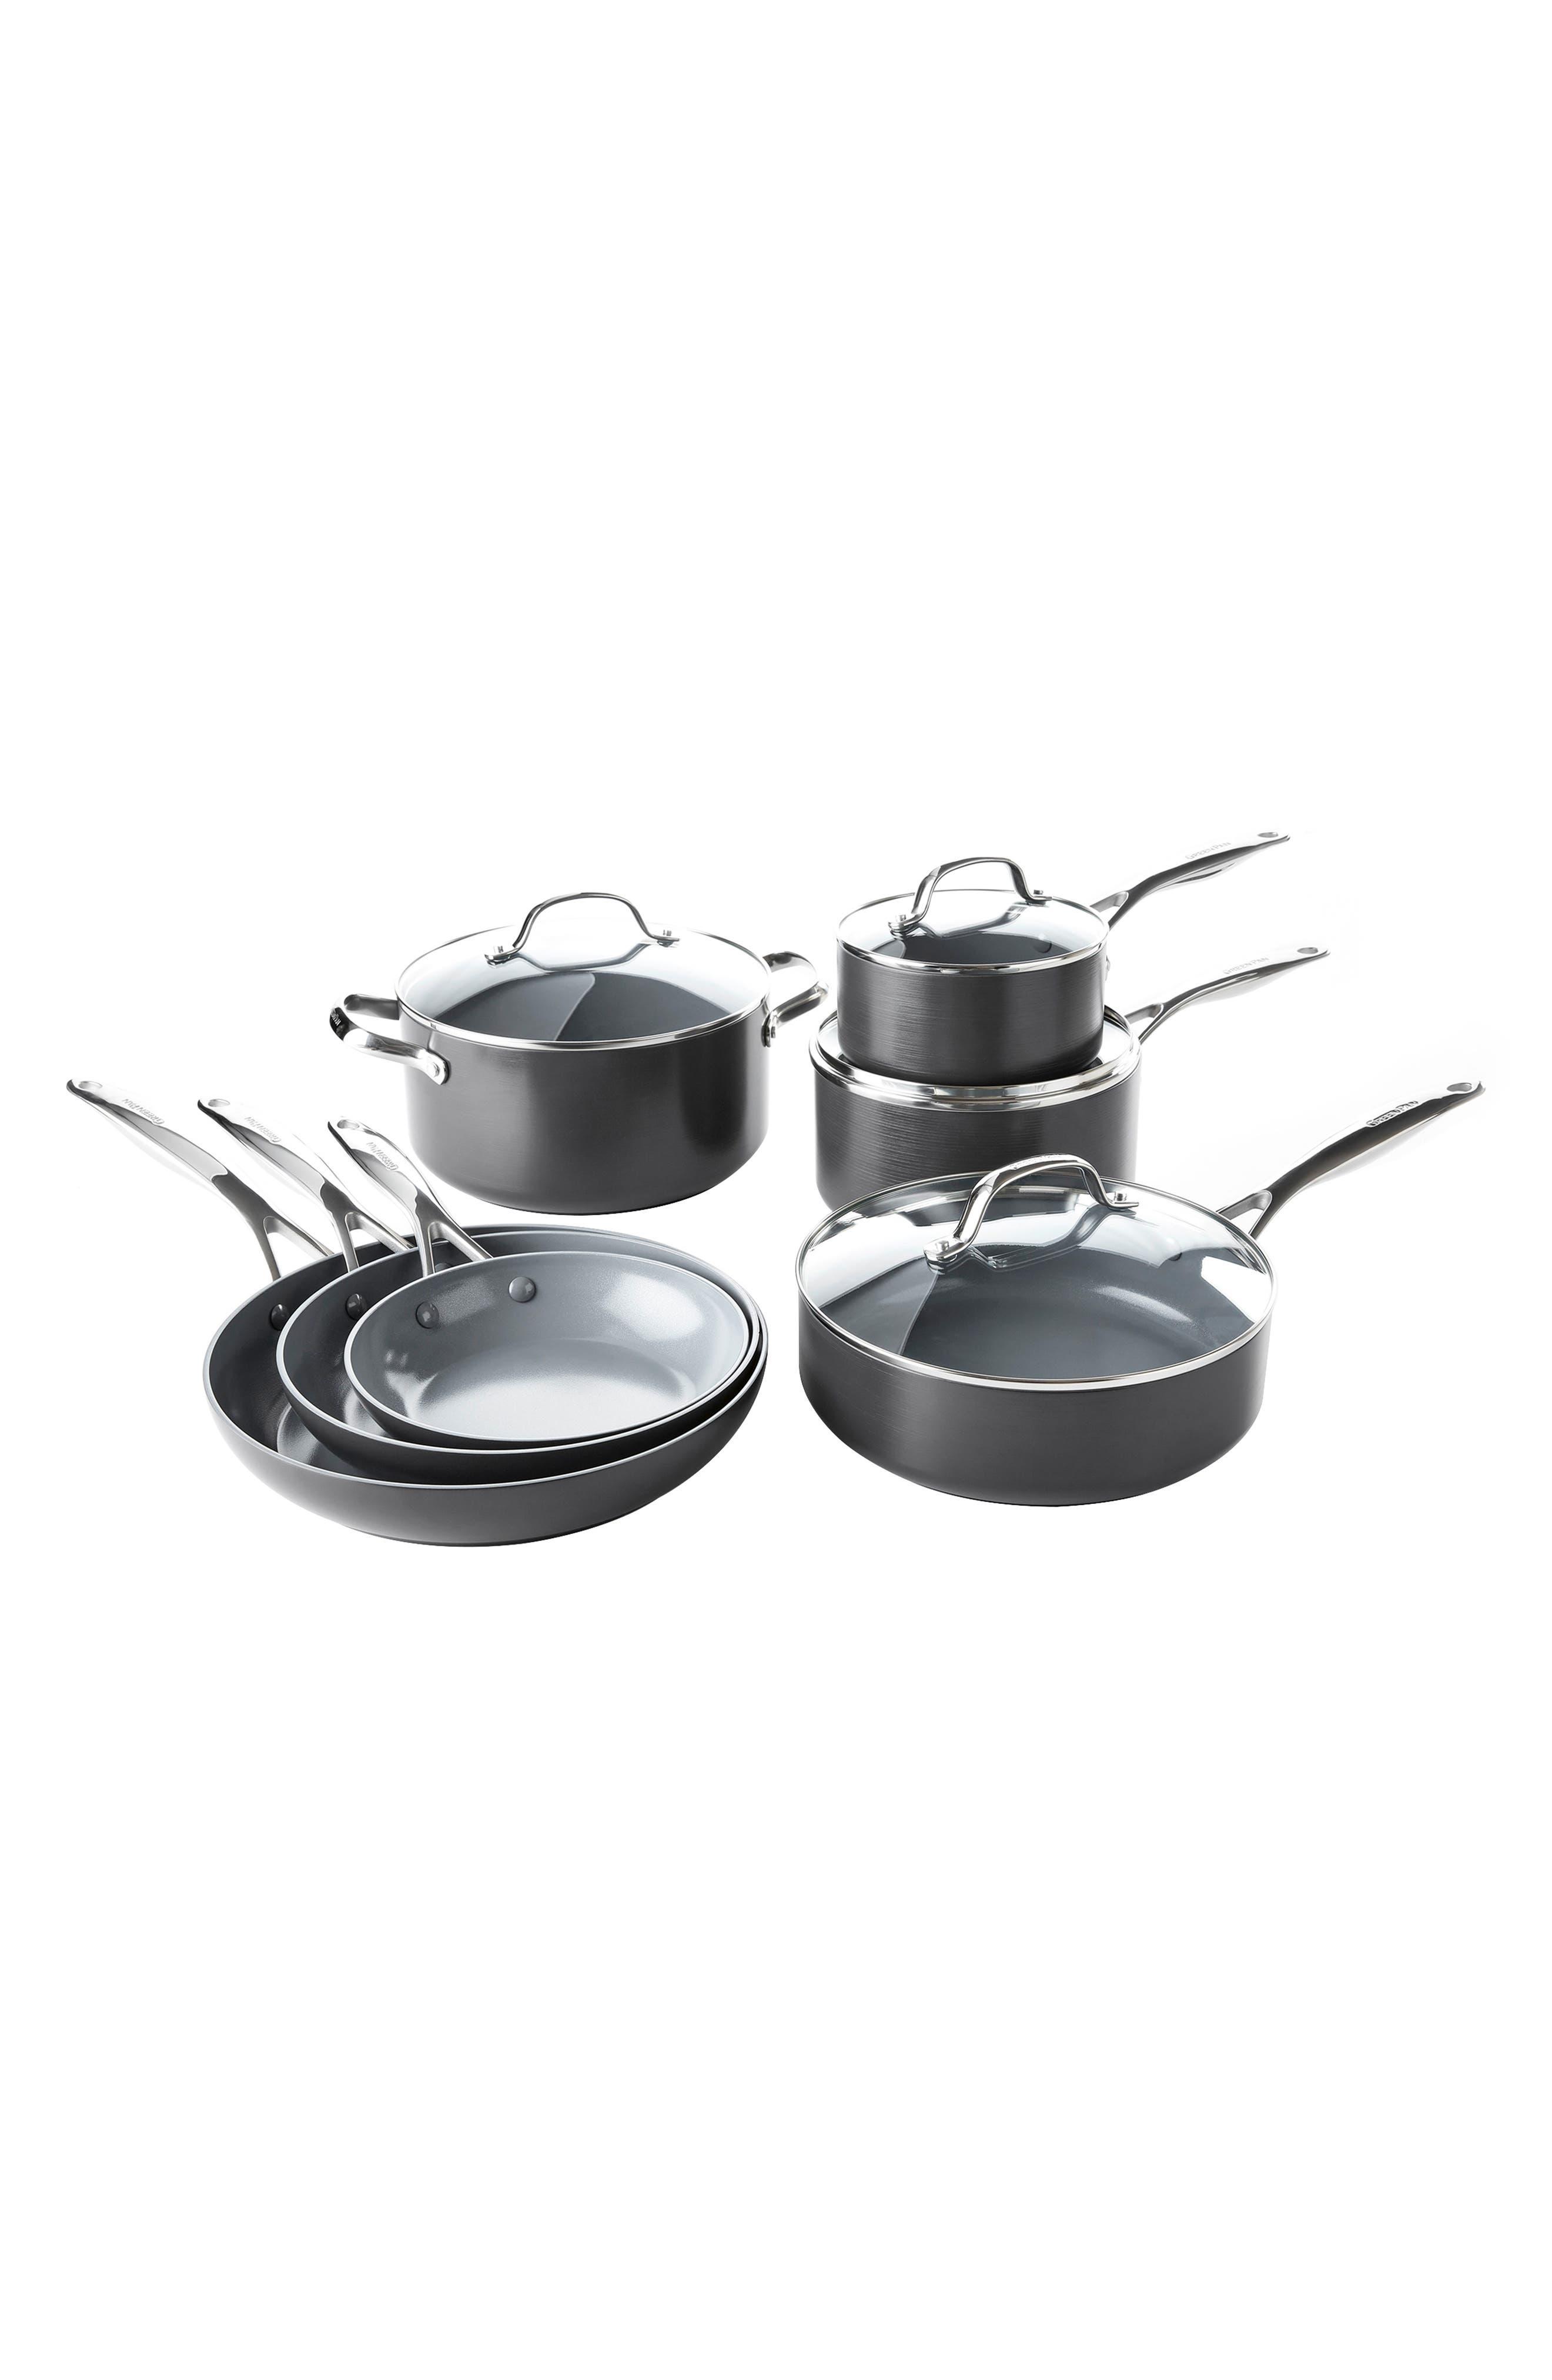 GreenPan Valencia Pro 11-Piece Anodized Aluminum Ceramic Nonstick Cookware Set